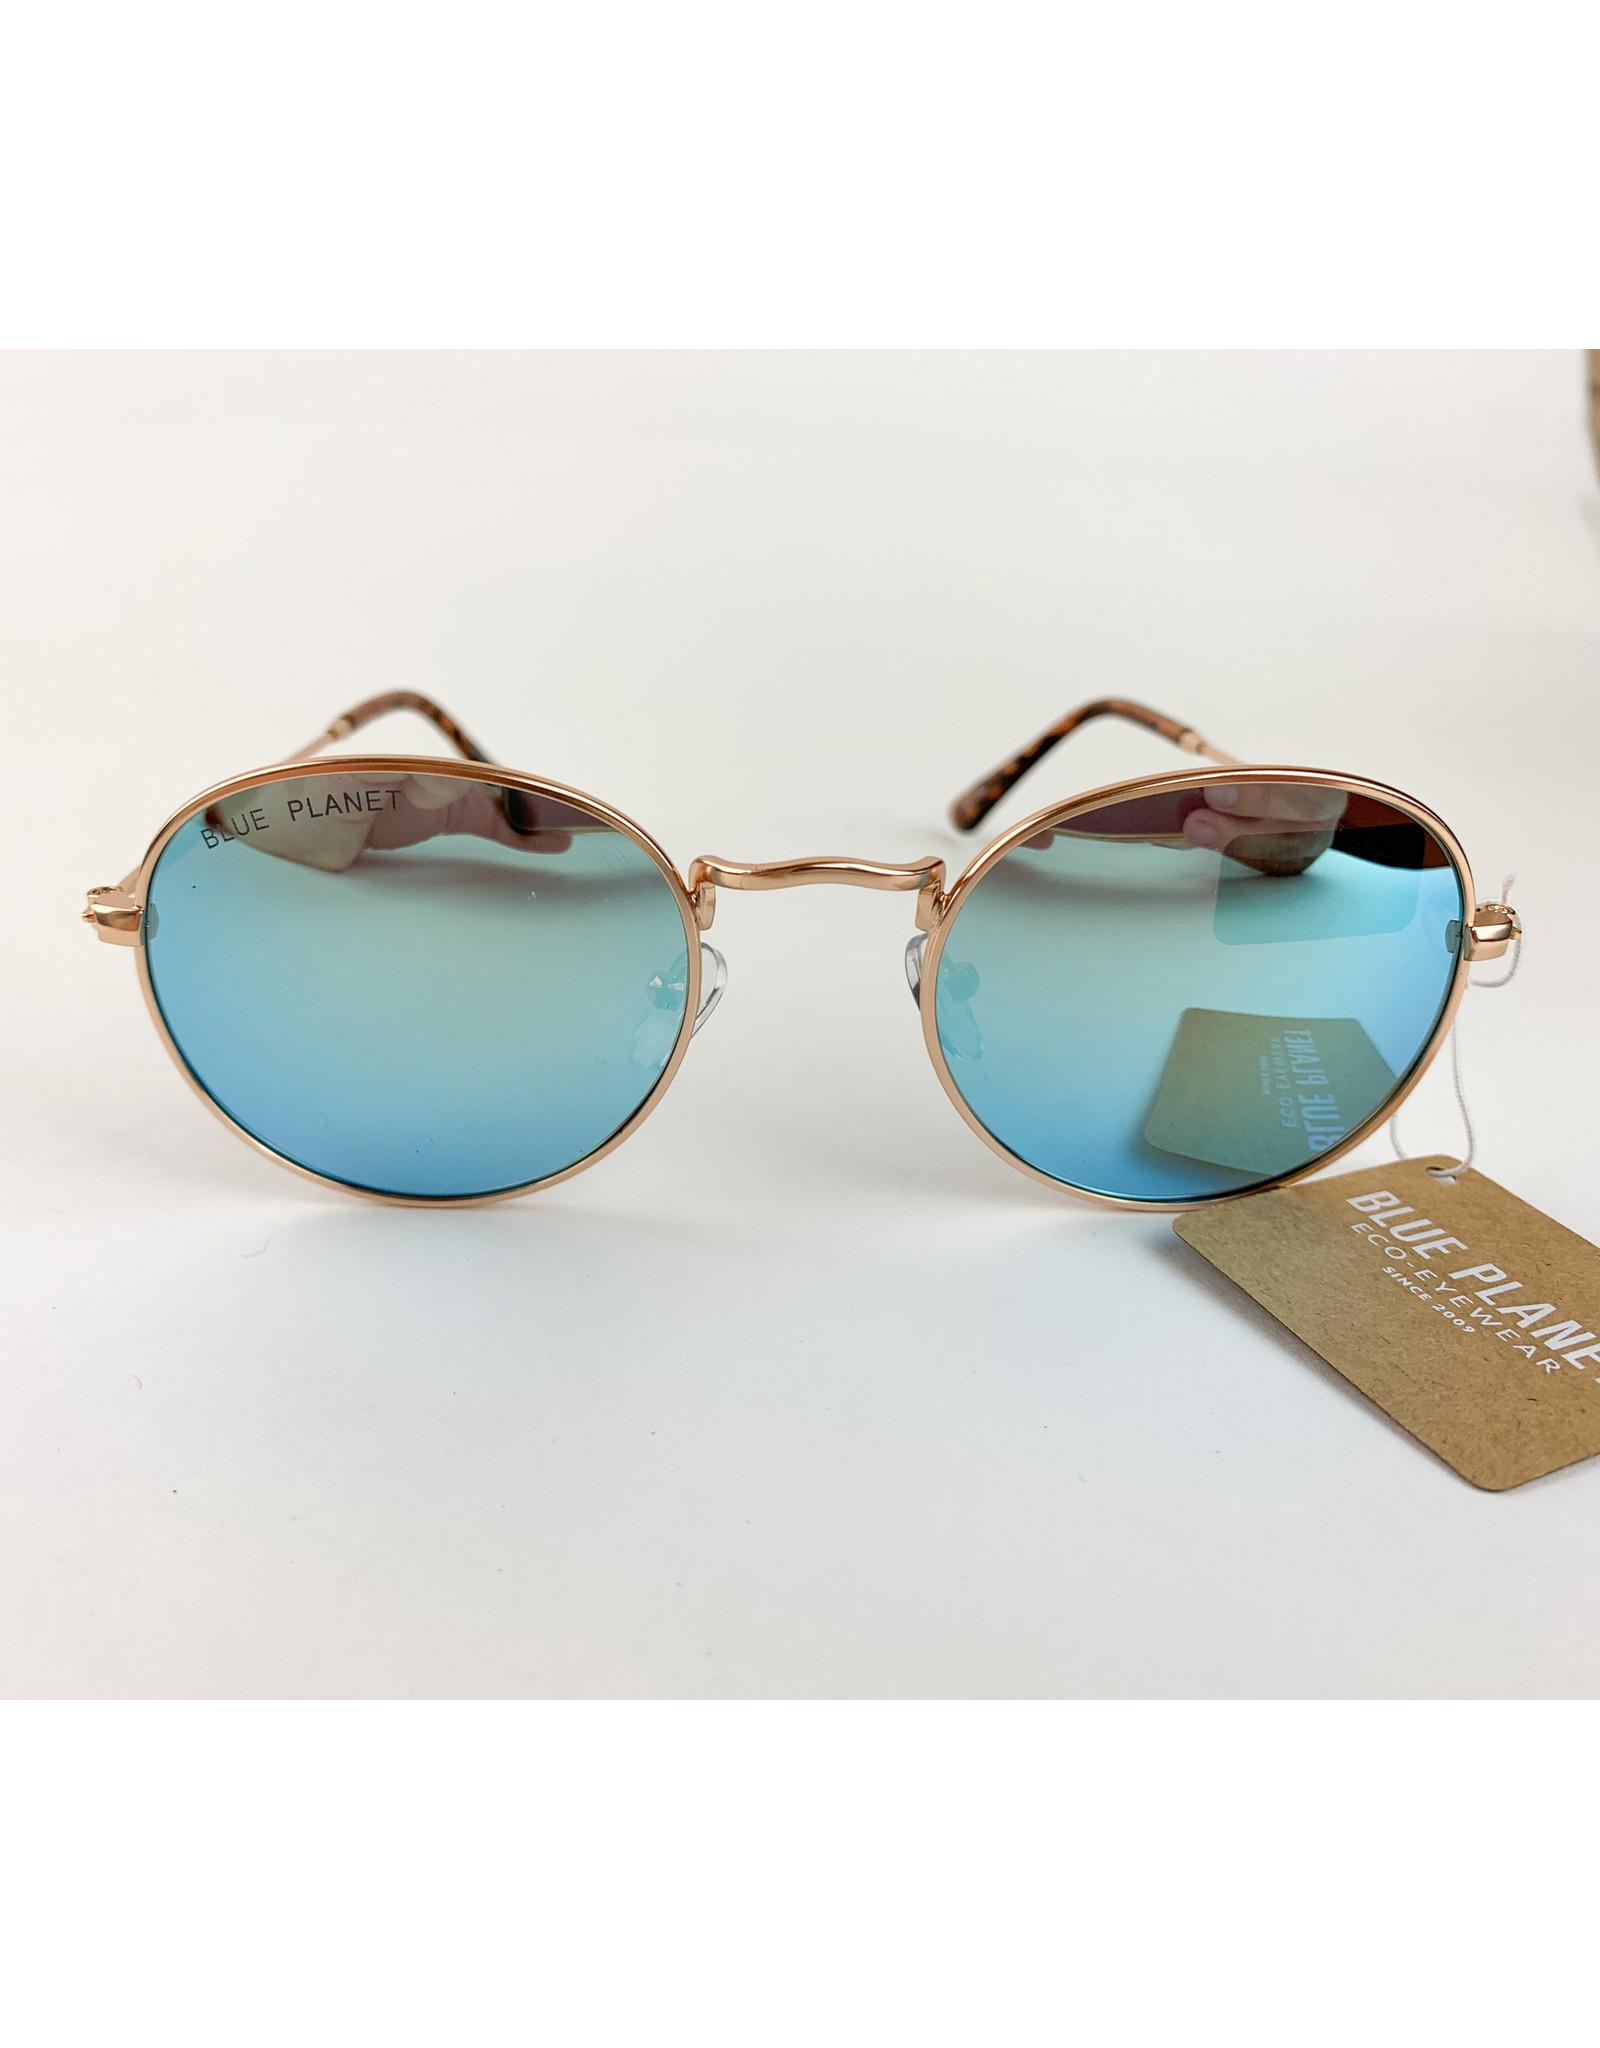 Blue Planet Sunglasses Ash Eco Process